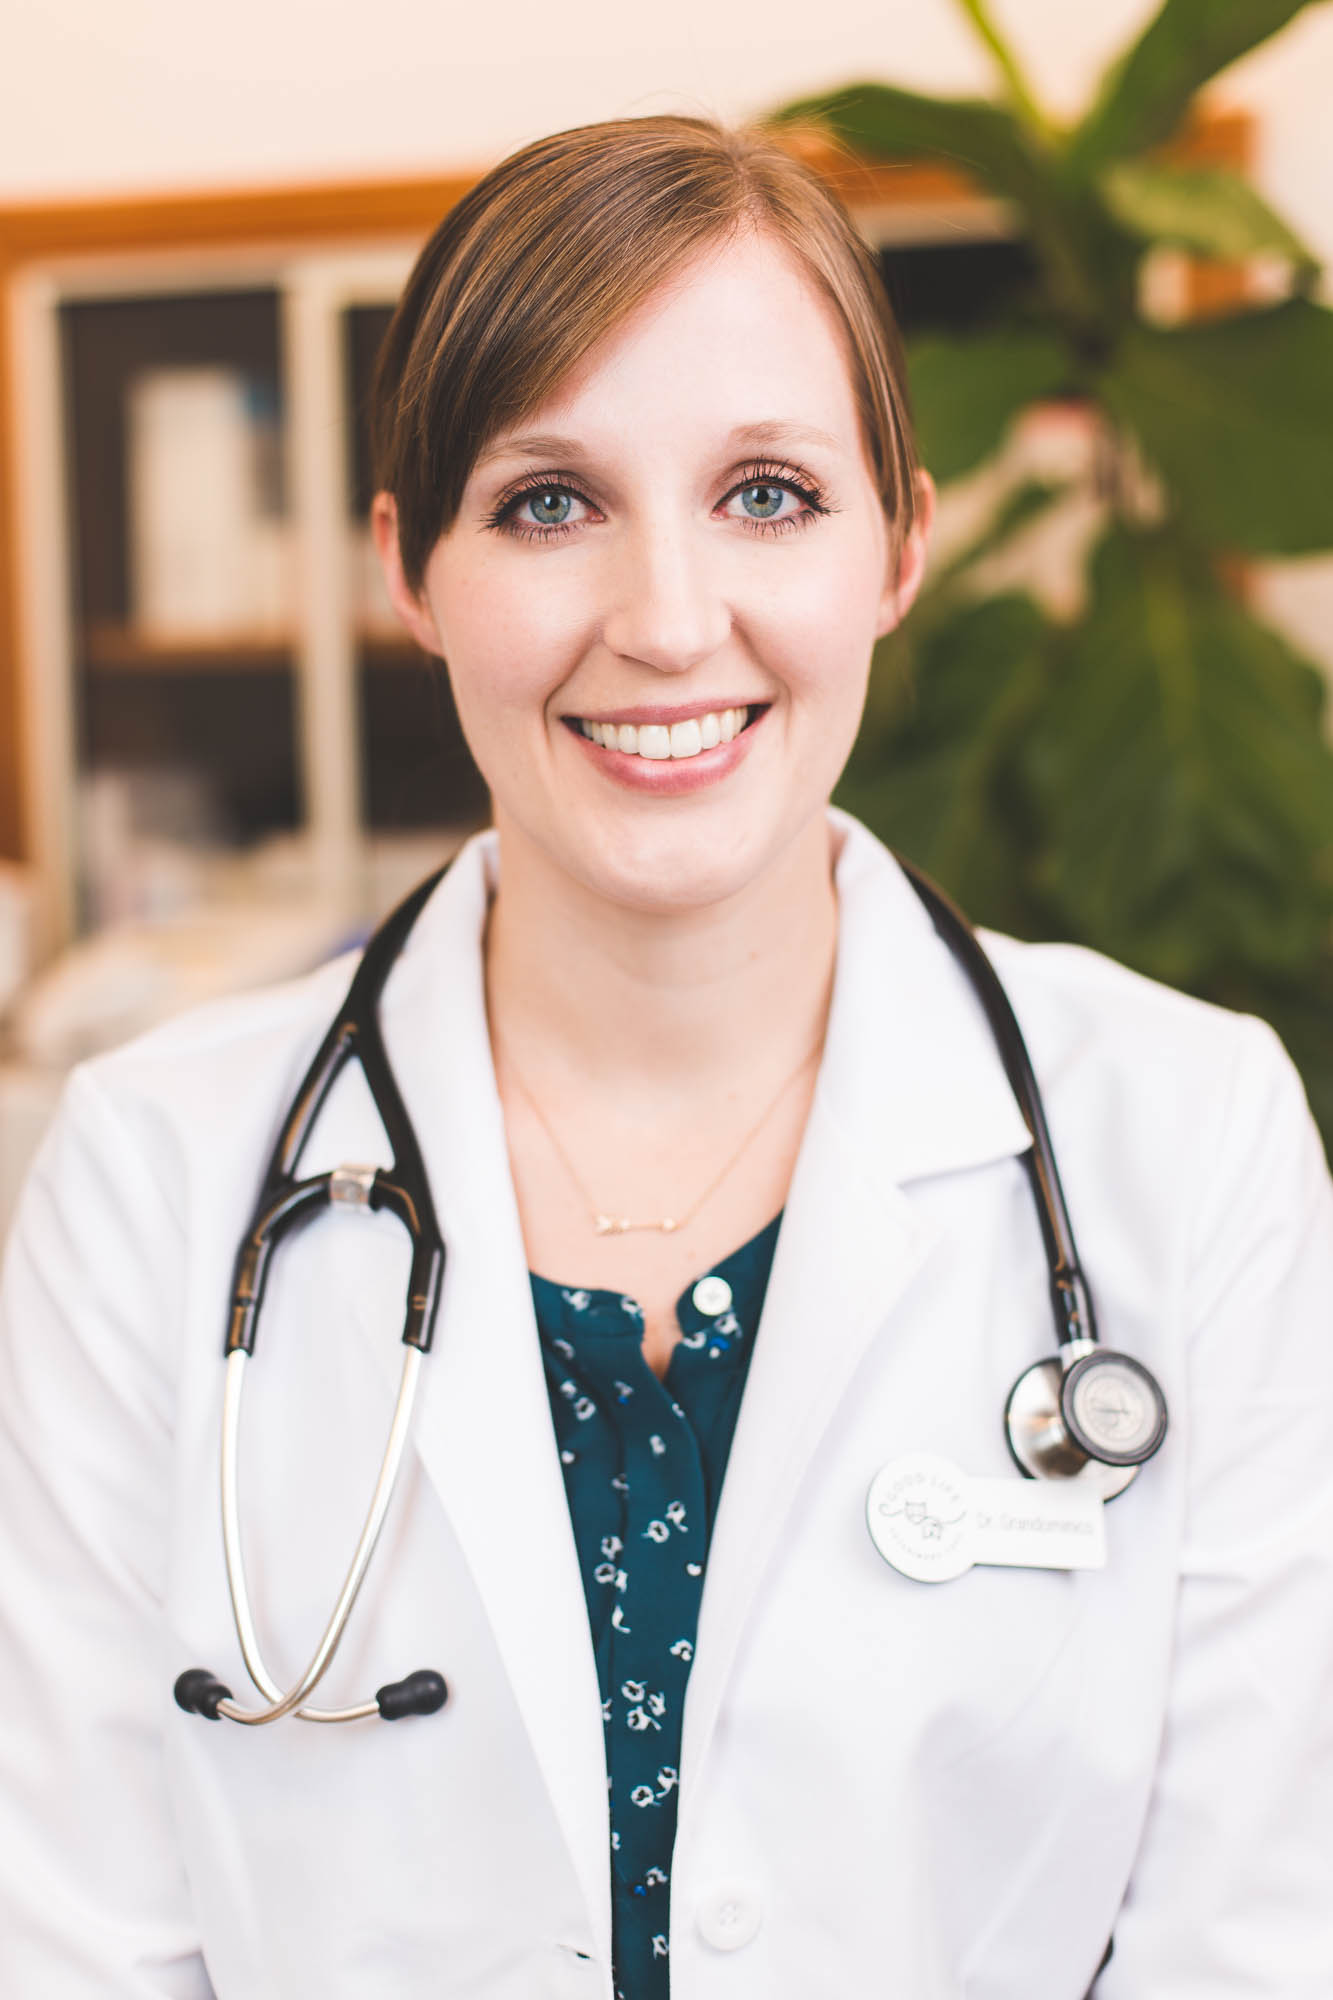 Vet Clinic Headshot